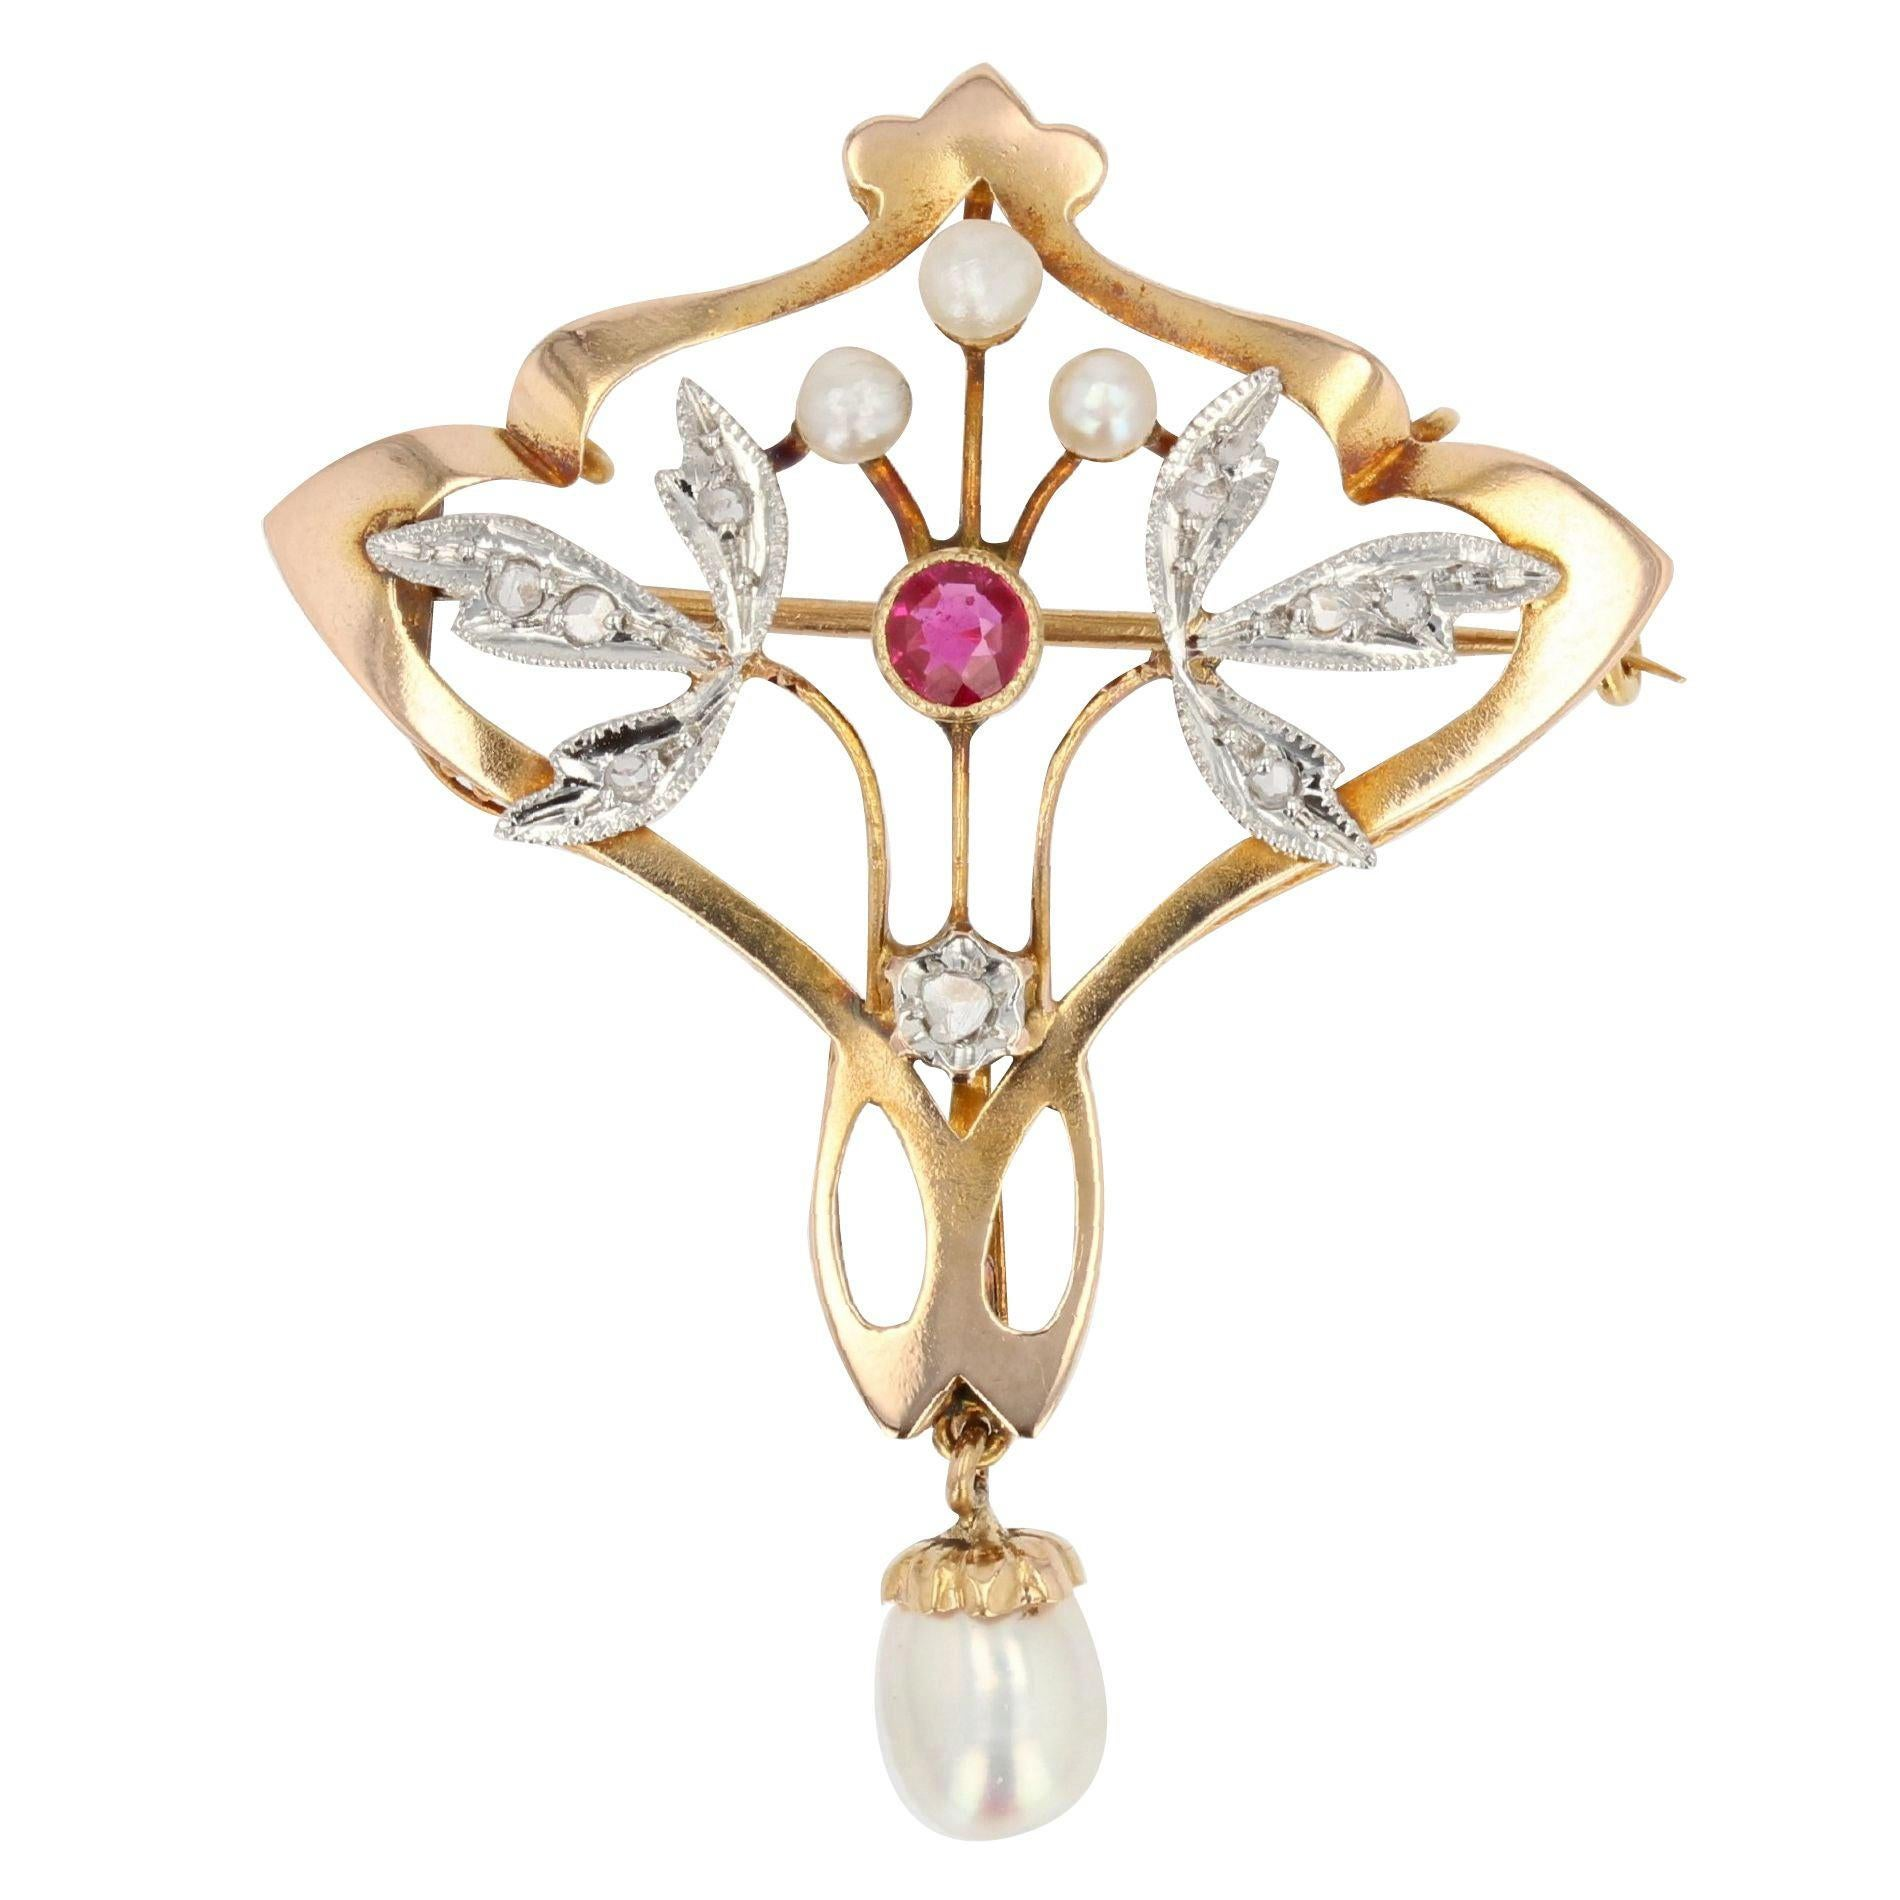 Art Nouveau Natural Pearl Diamond Ruby 18 Karat Yellow Gold Pendant, Brooch